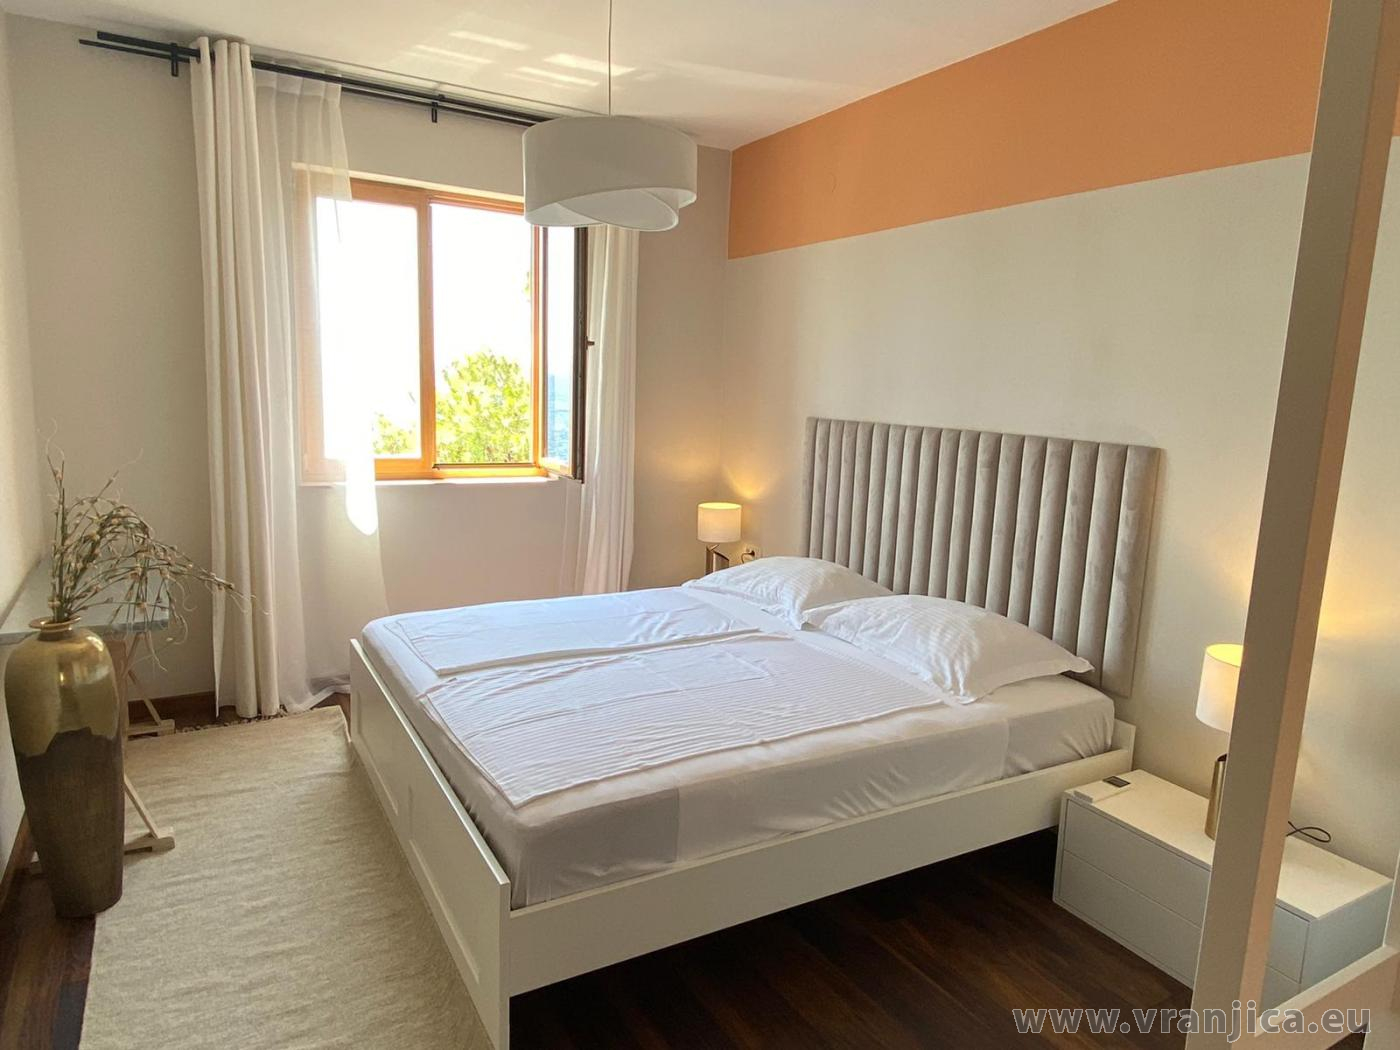 https://www.vranjica.eu/pokoje/apartman-veronika-ap1-4-6-1627477201L.jpg